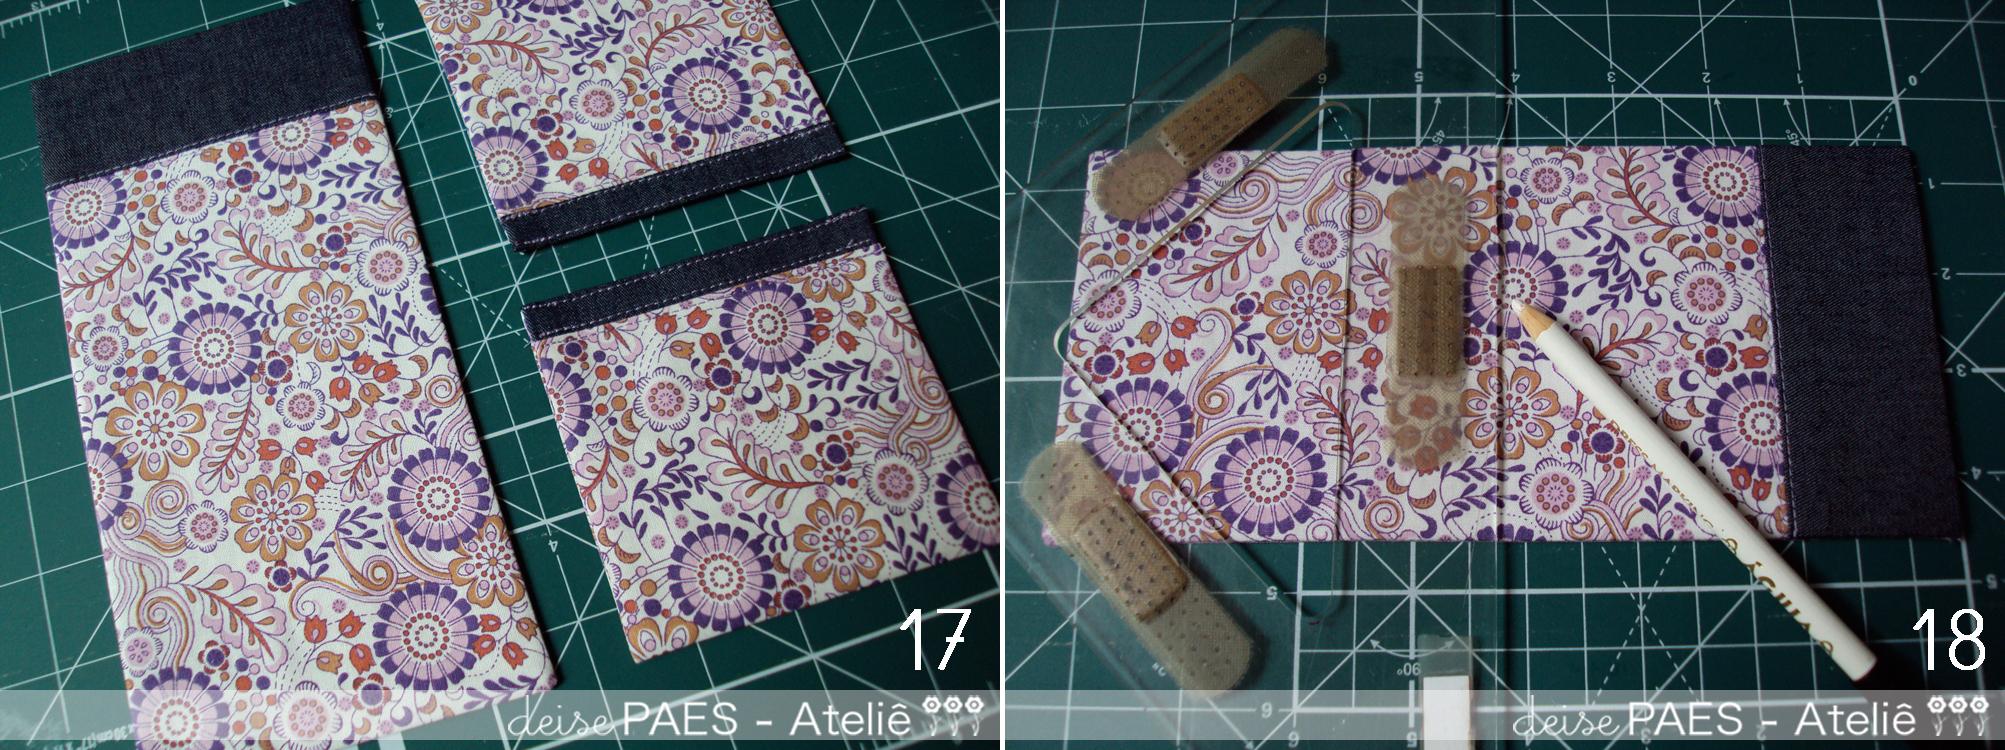 porta-absorventes - 09